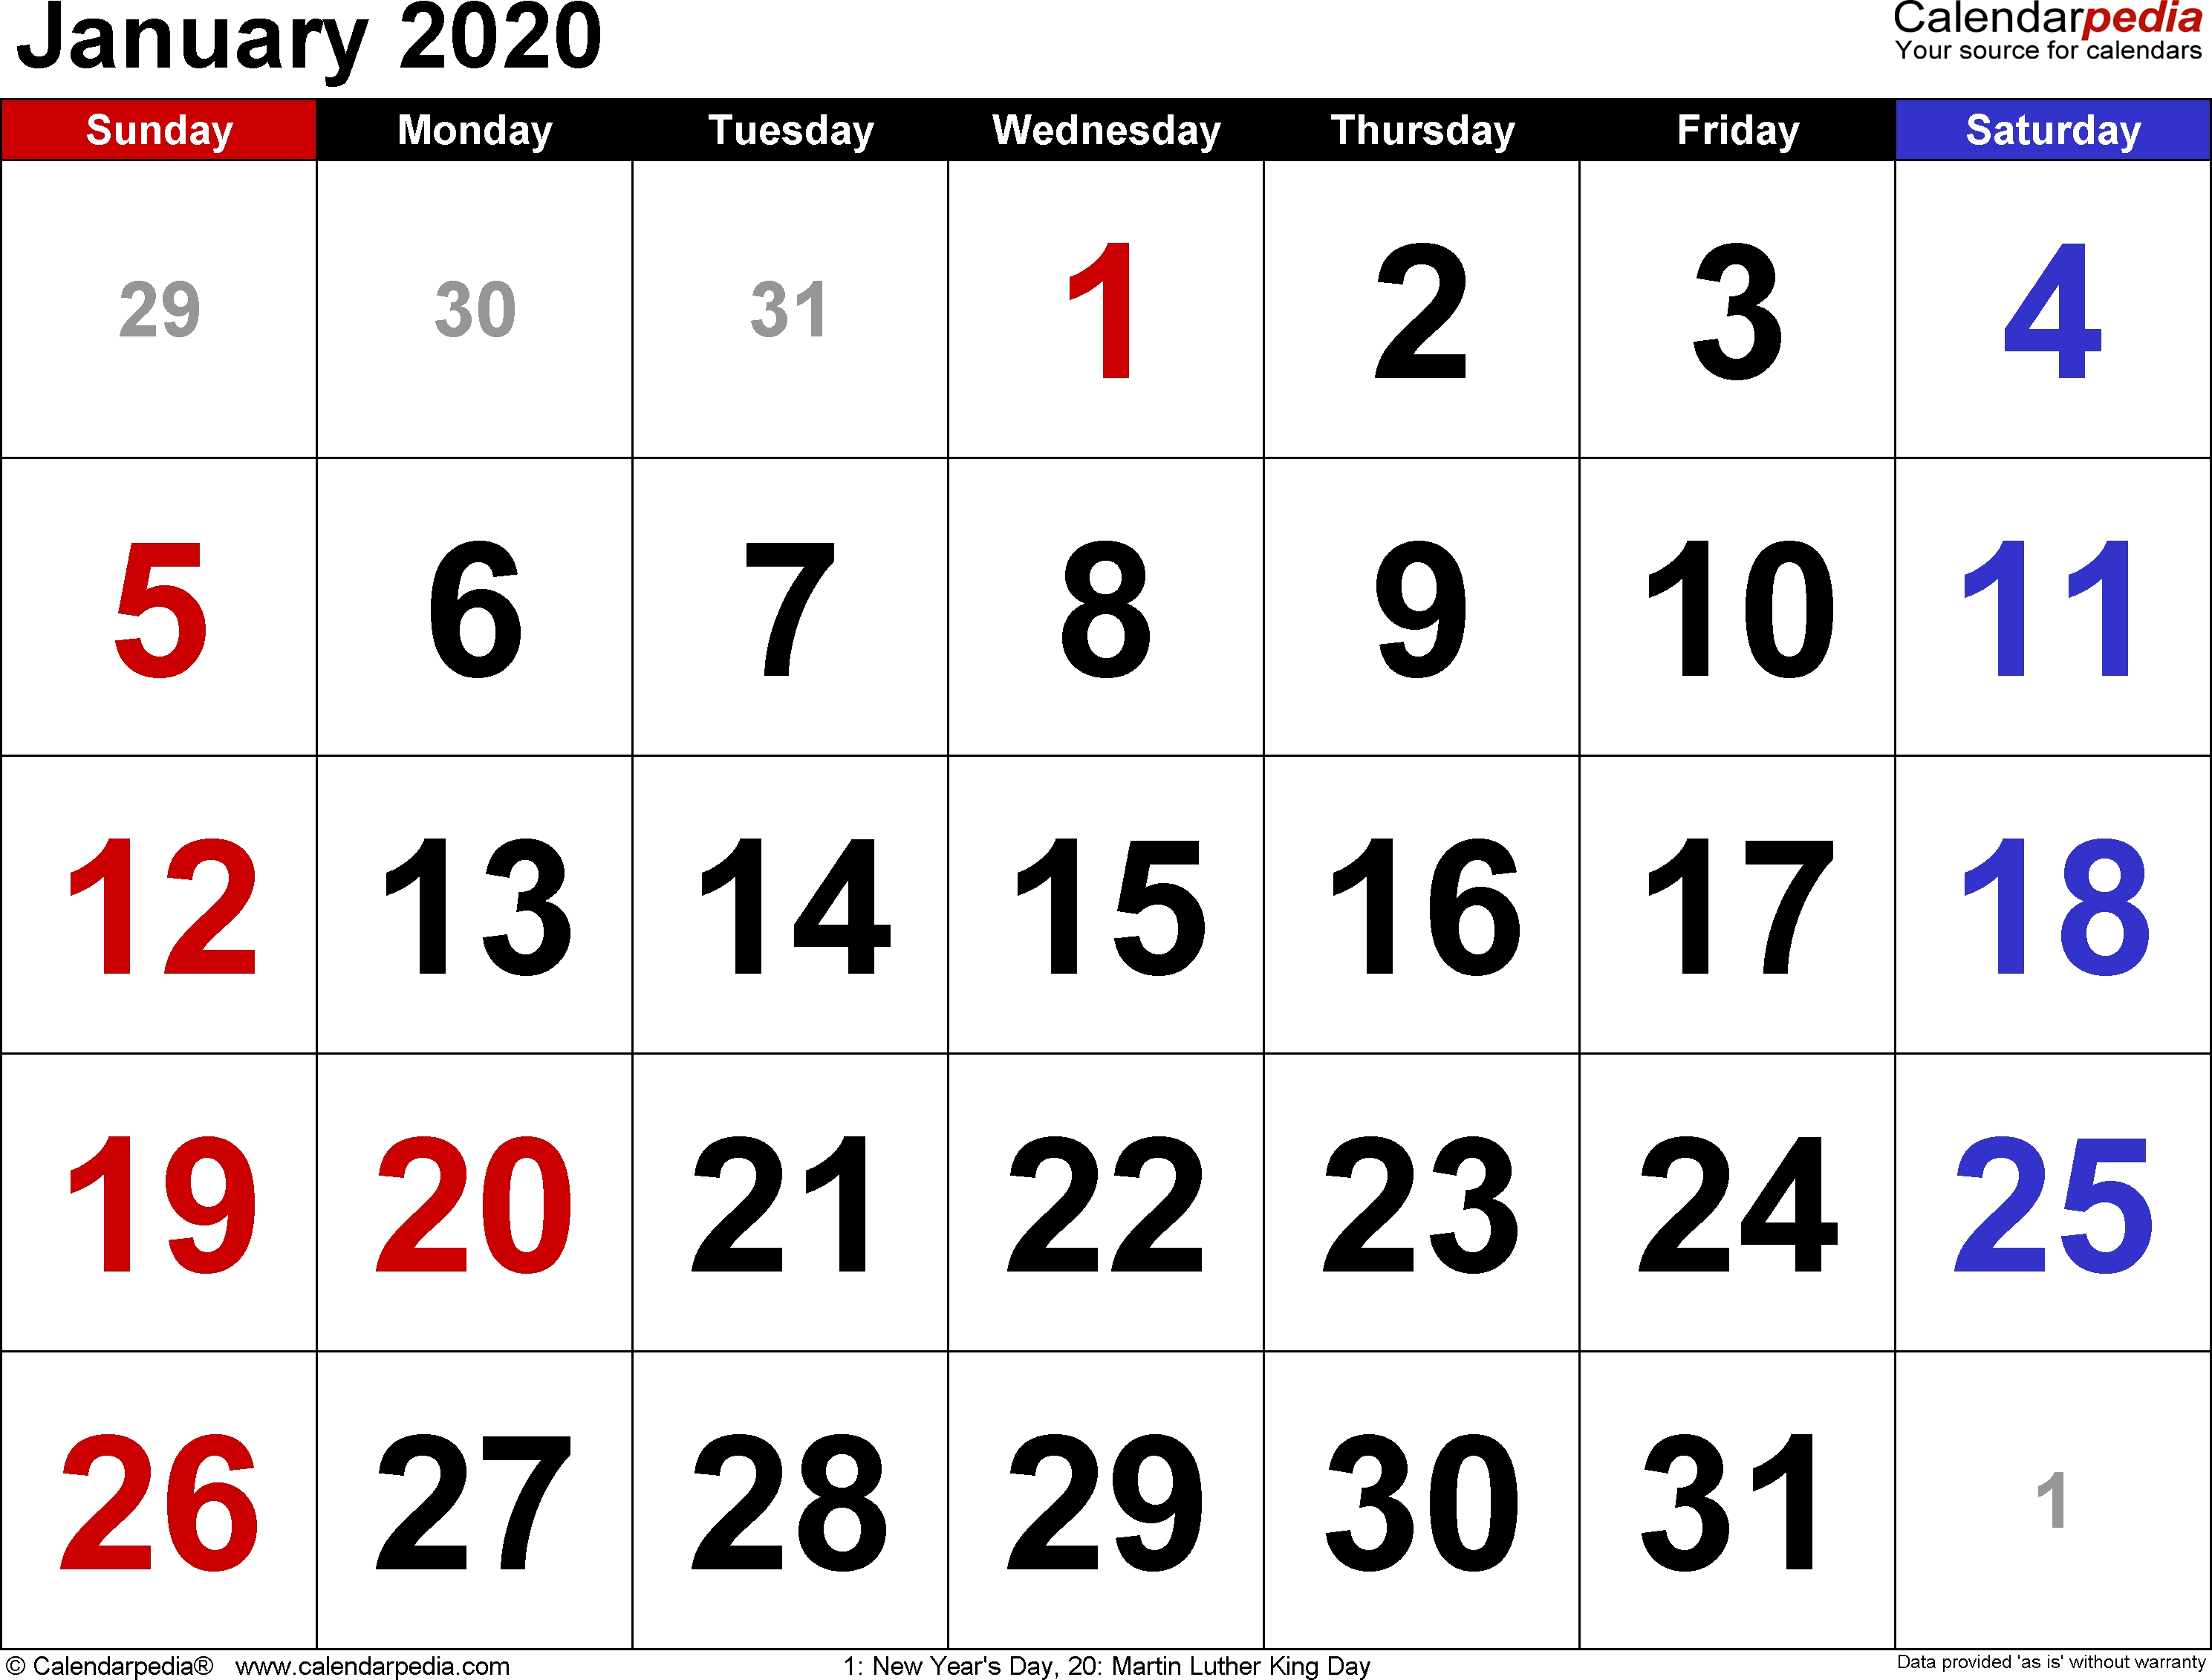 January 2020 Calendars For Word, Excel & Pdf-Fillable January 2020 Calendar